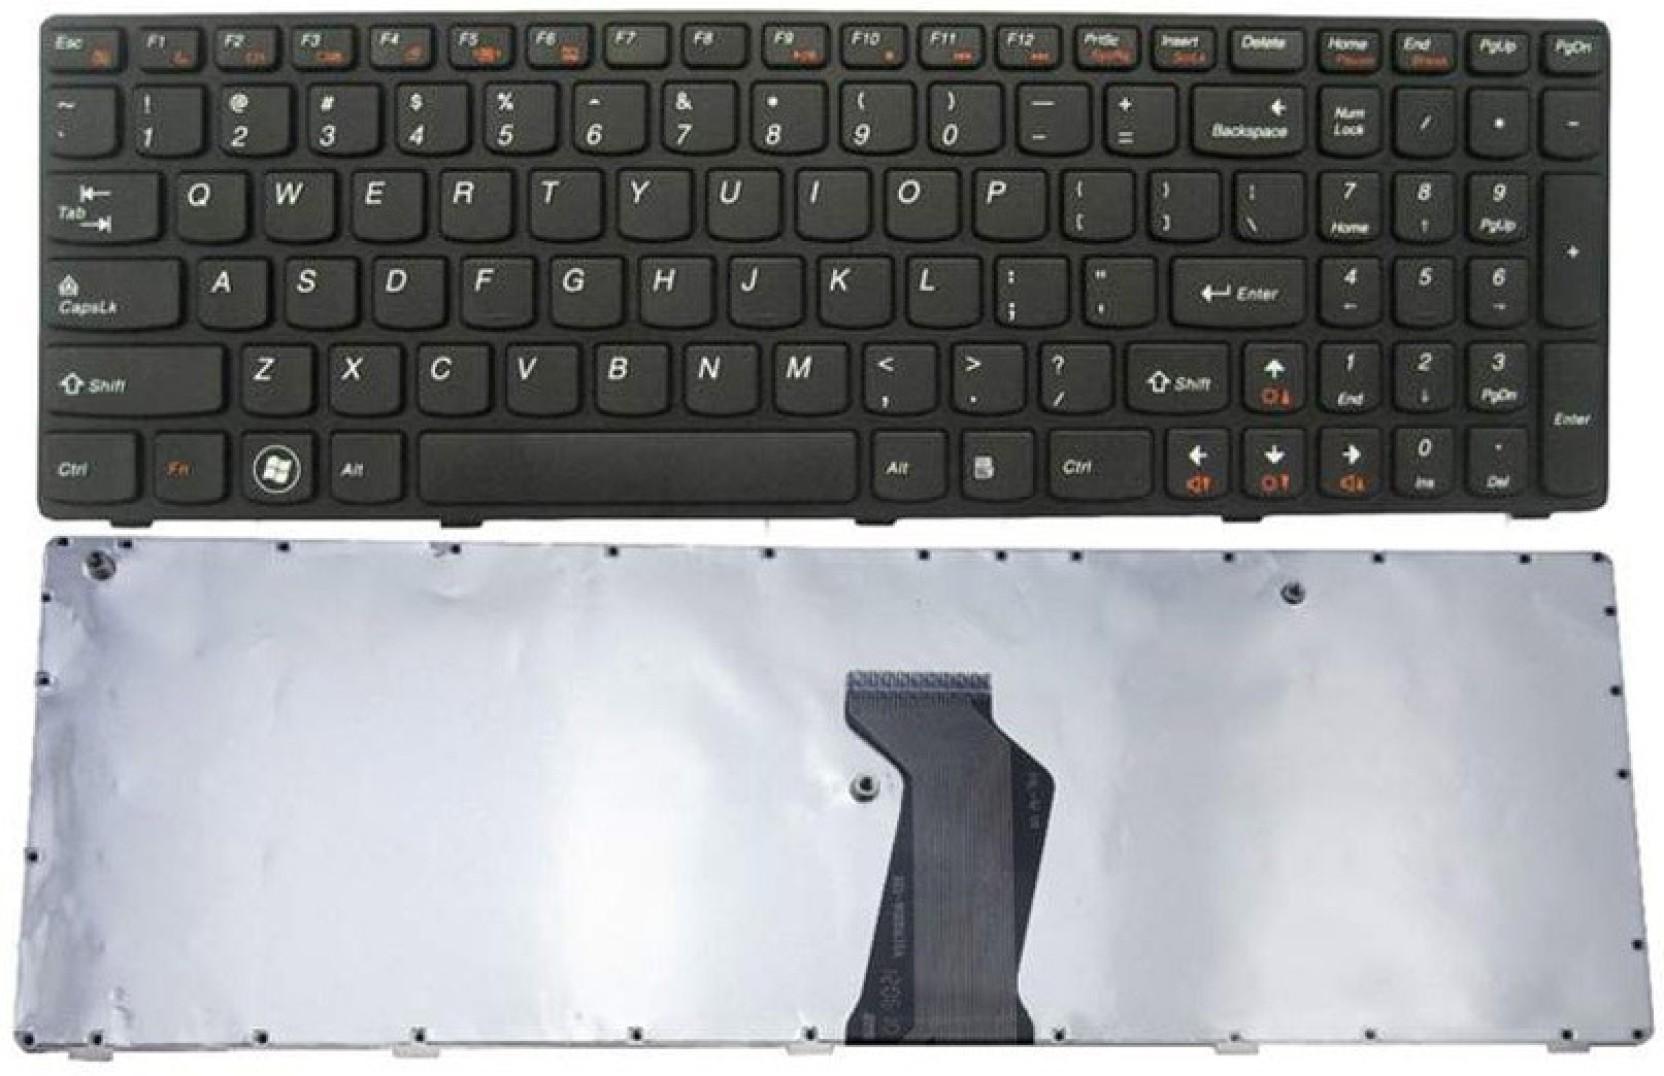 Lenovo G570 Laptop Keyboard Replacement Key Price in India